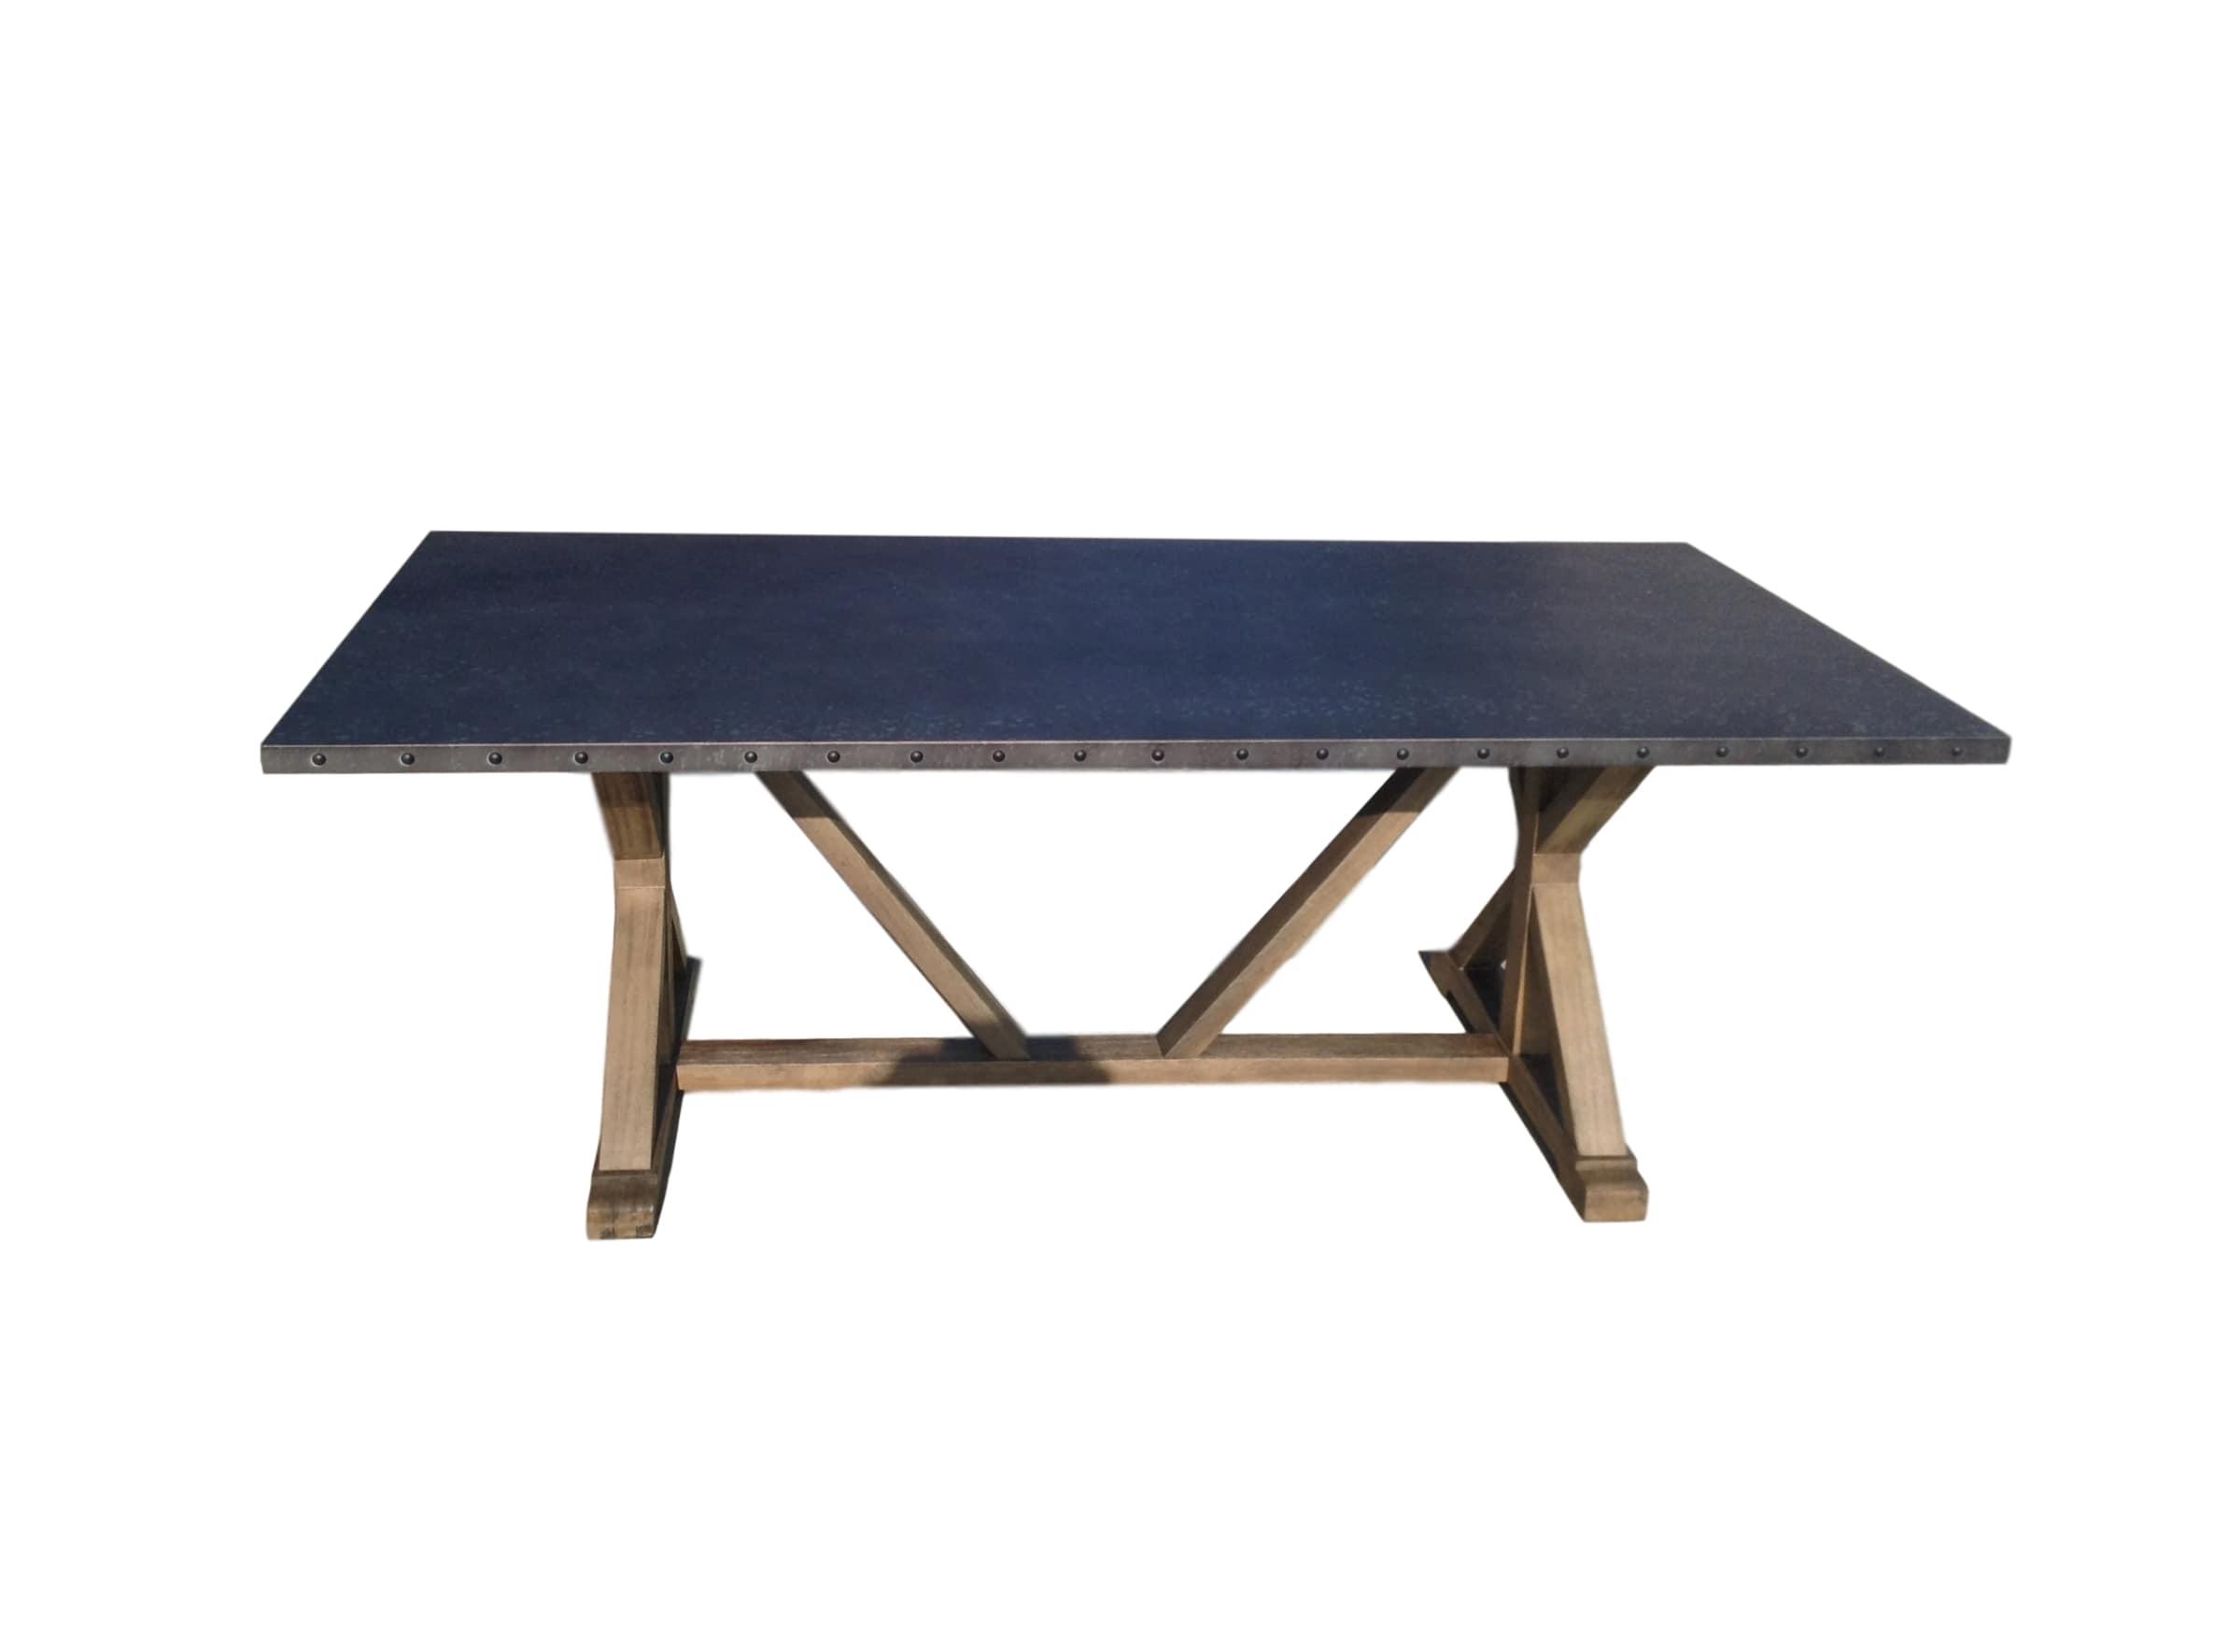 stainless steel top dining table alabama furniture. Black Bedroom Furniture Sets. Home Design Ideas